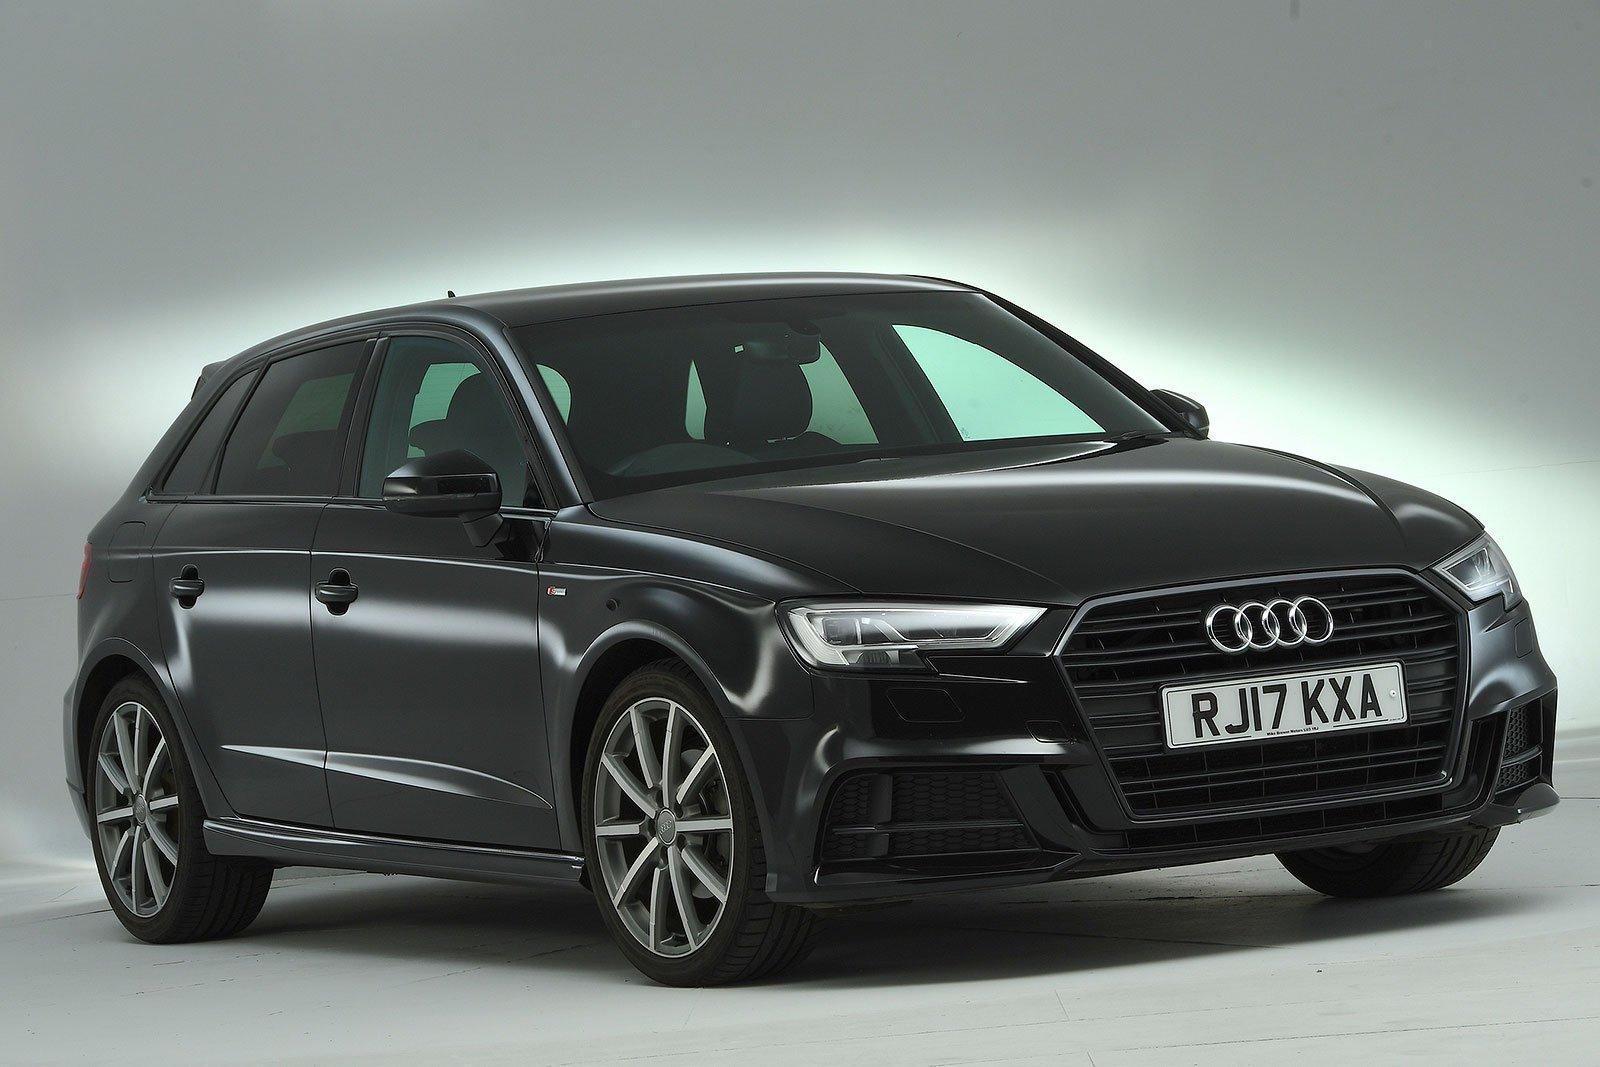 Audi A3 Sportback (2013-present)